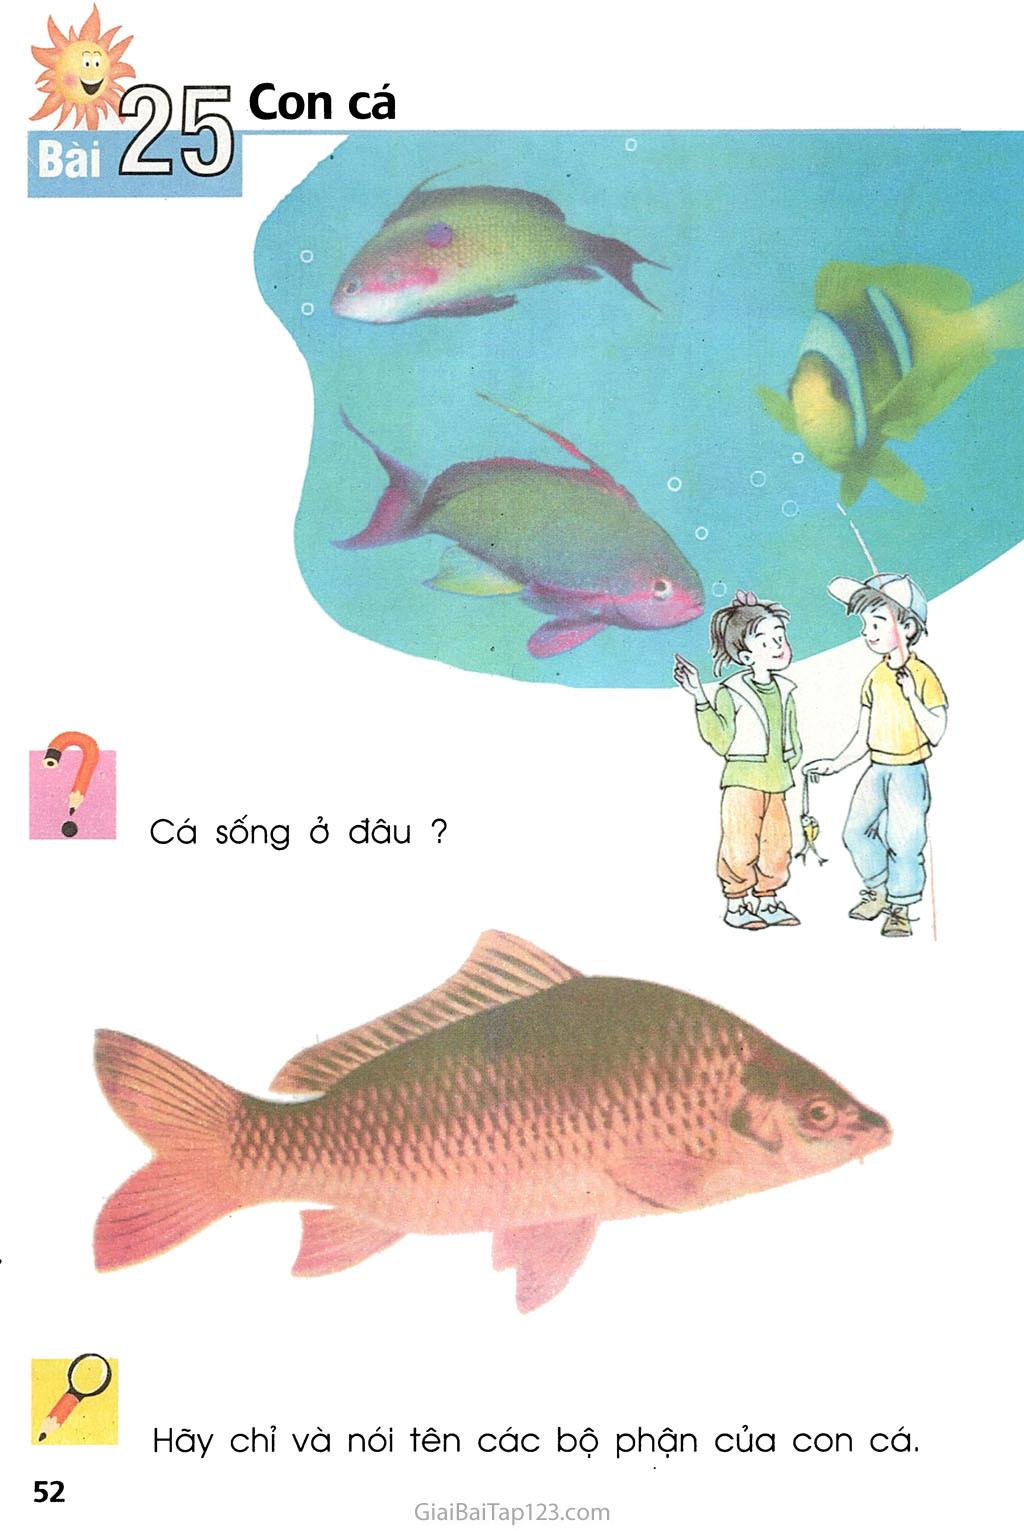 Bài 25. Con cá trang 1